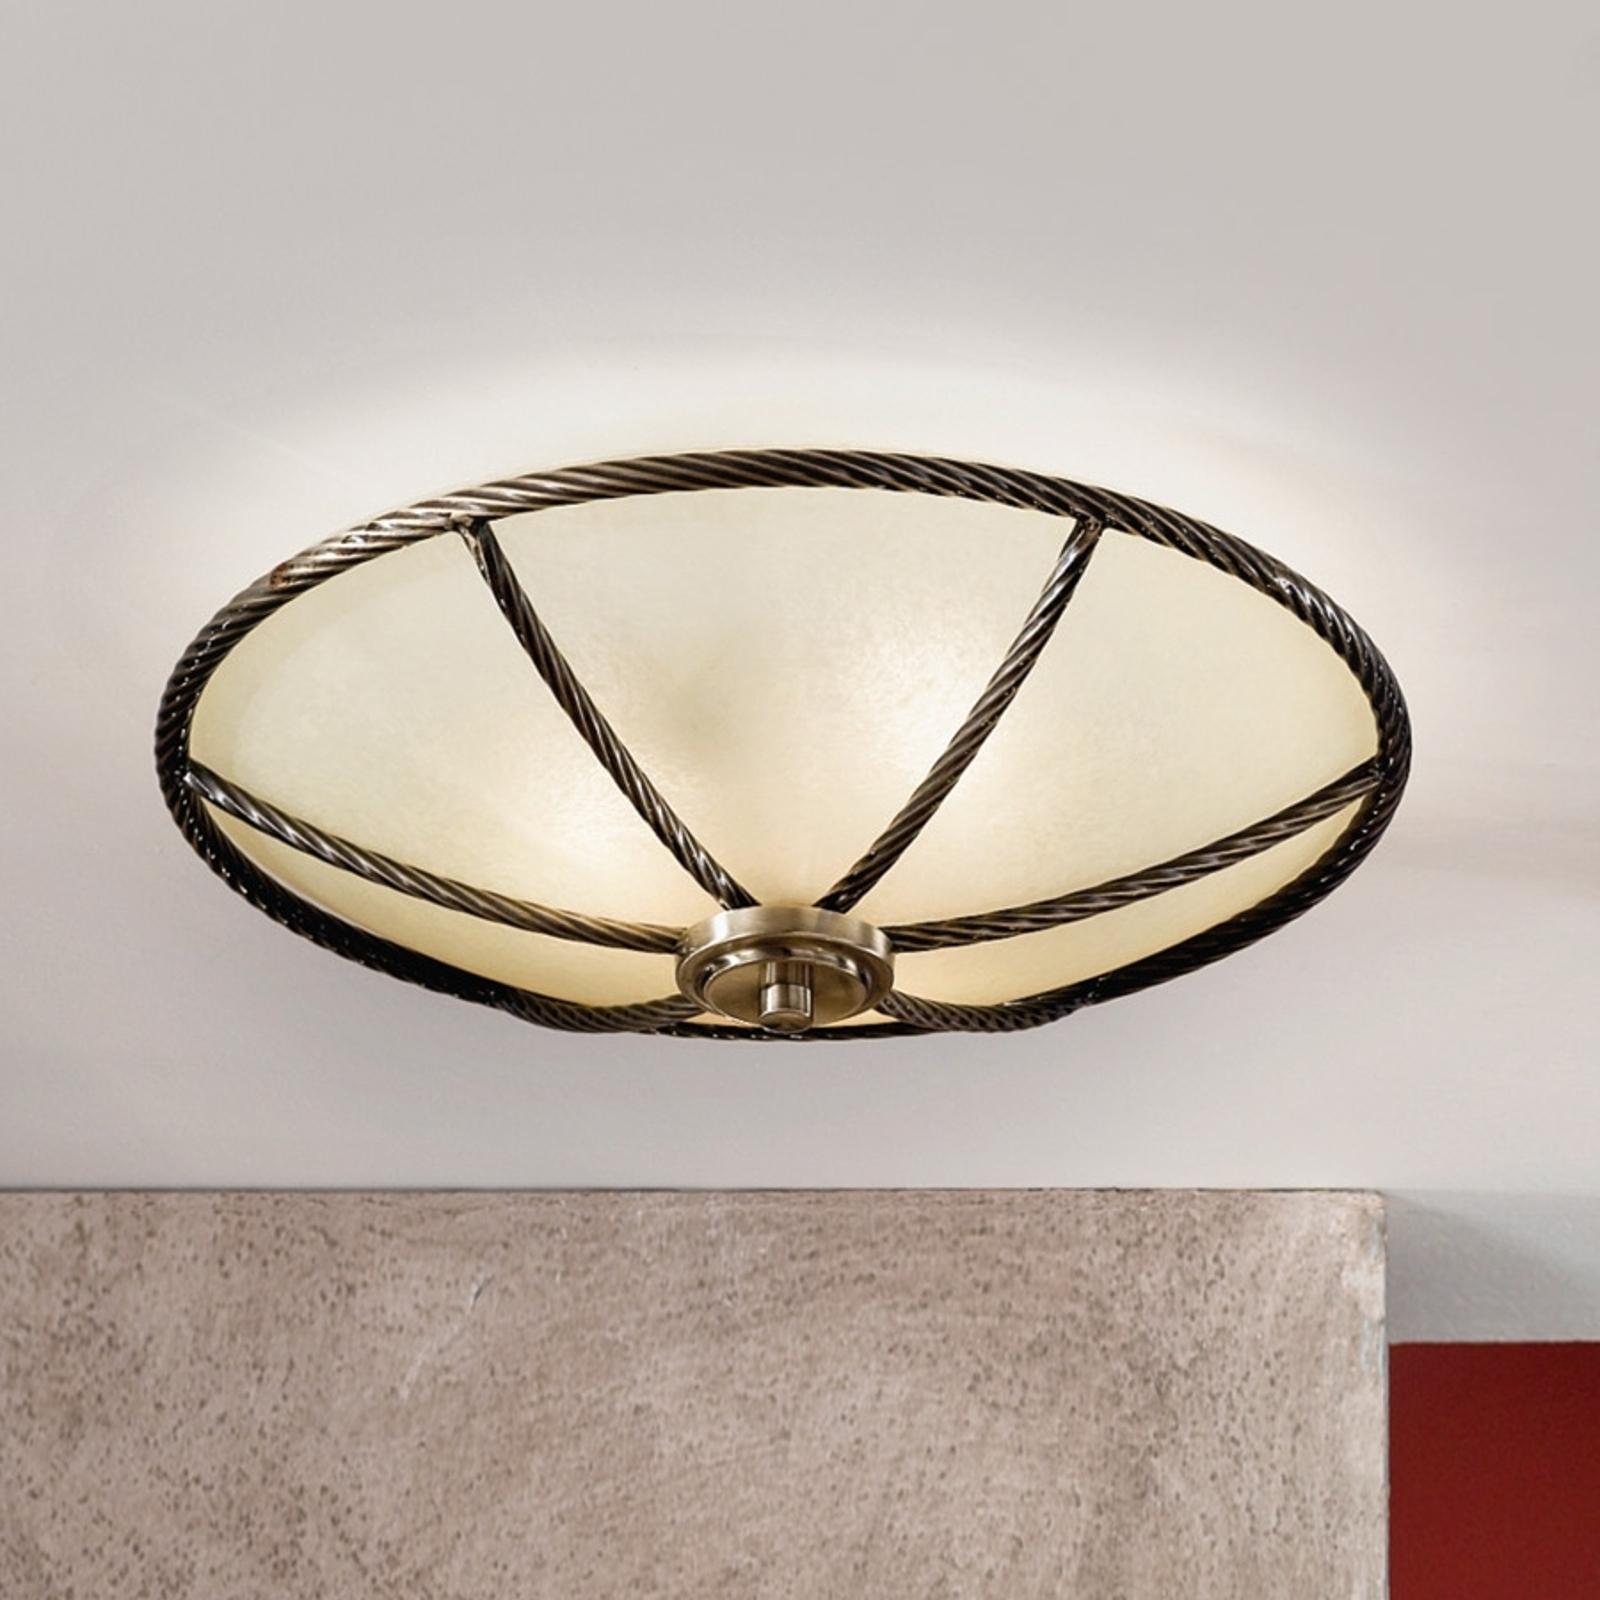 Lampa sufitowa kolor szampański Galina 42 cm